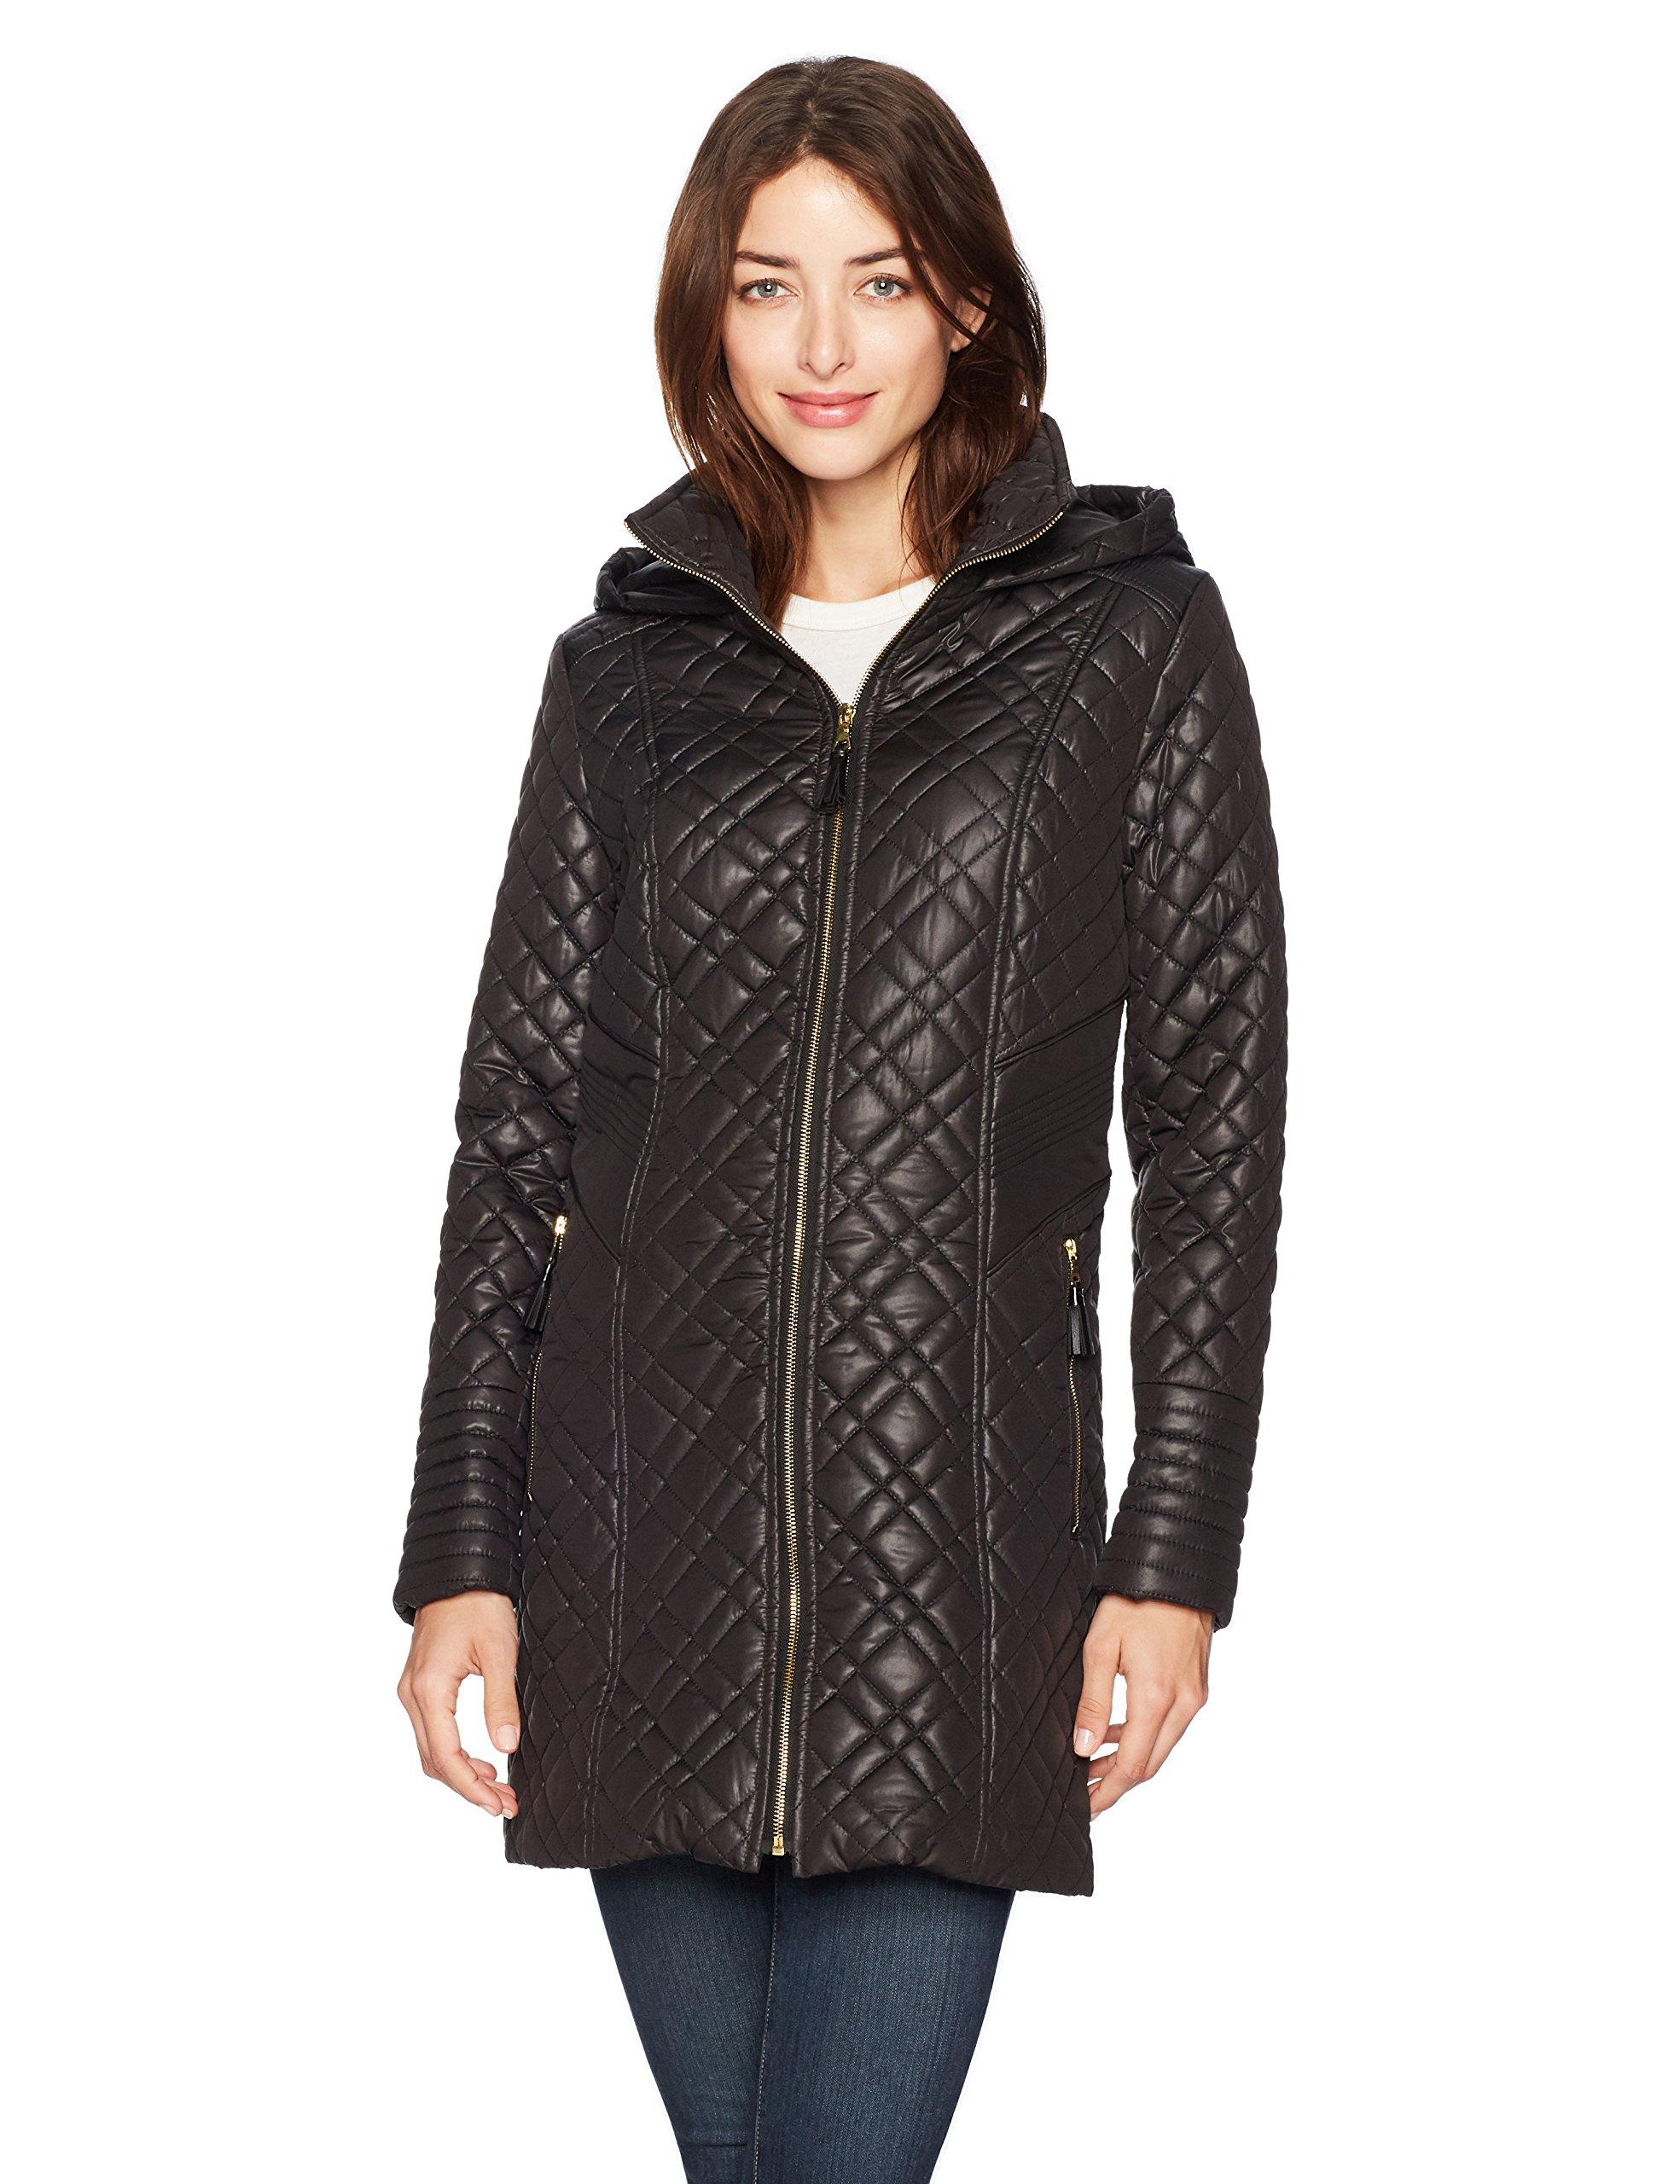 Via Spiga Women's Center Zip Diamond Quilt Coat with Hood, Black, Large by Via Spiga